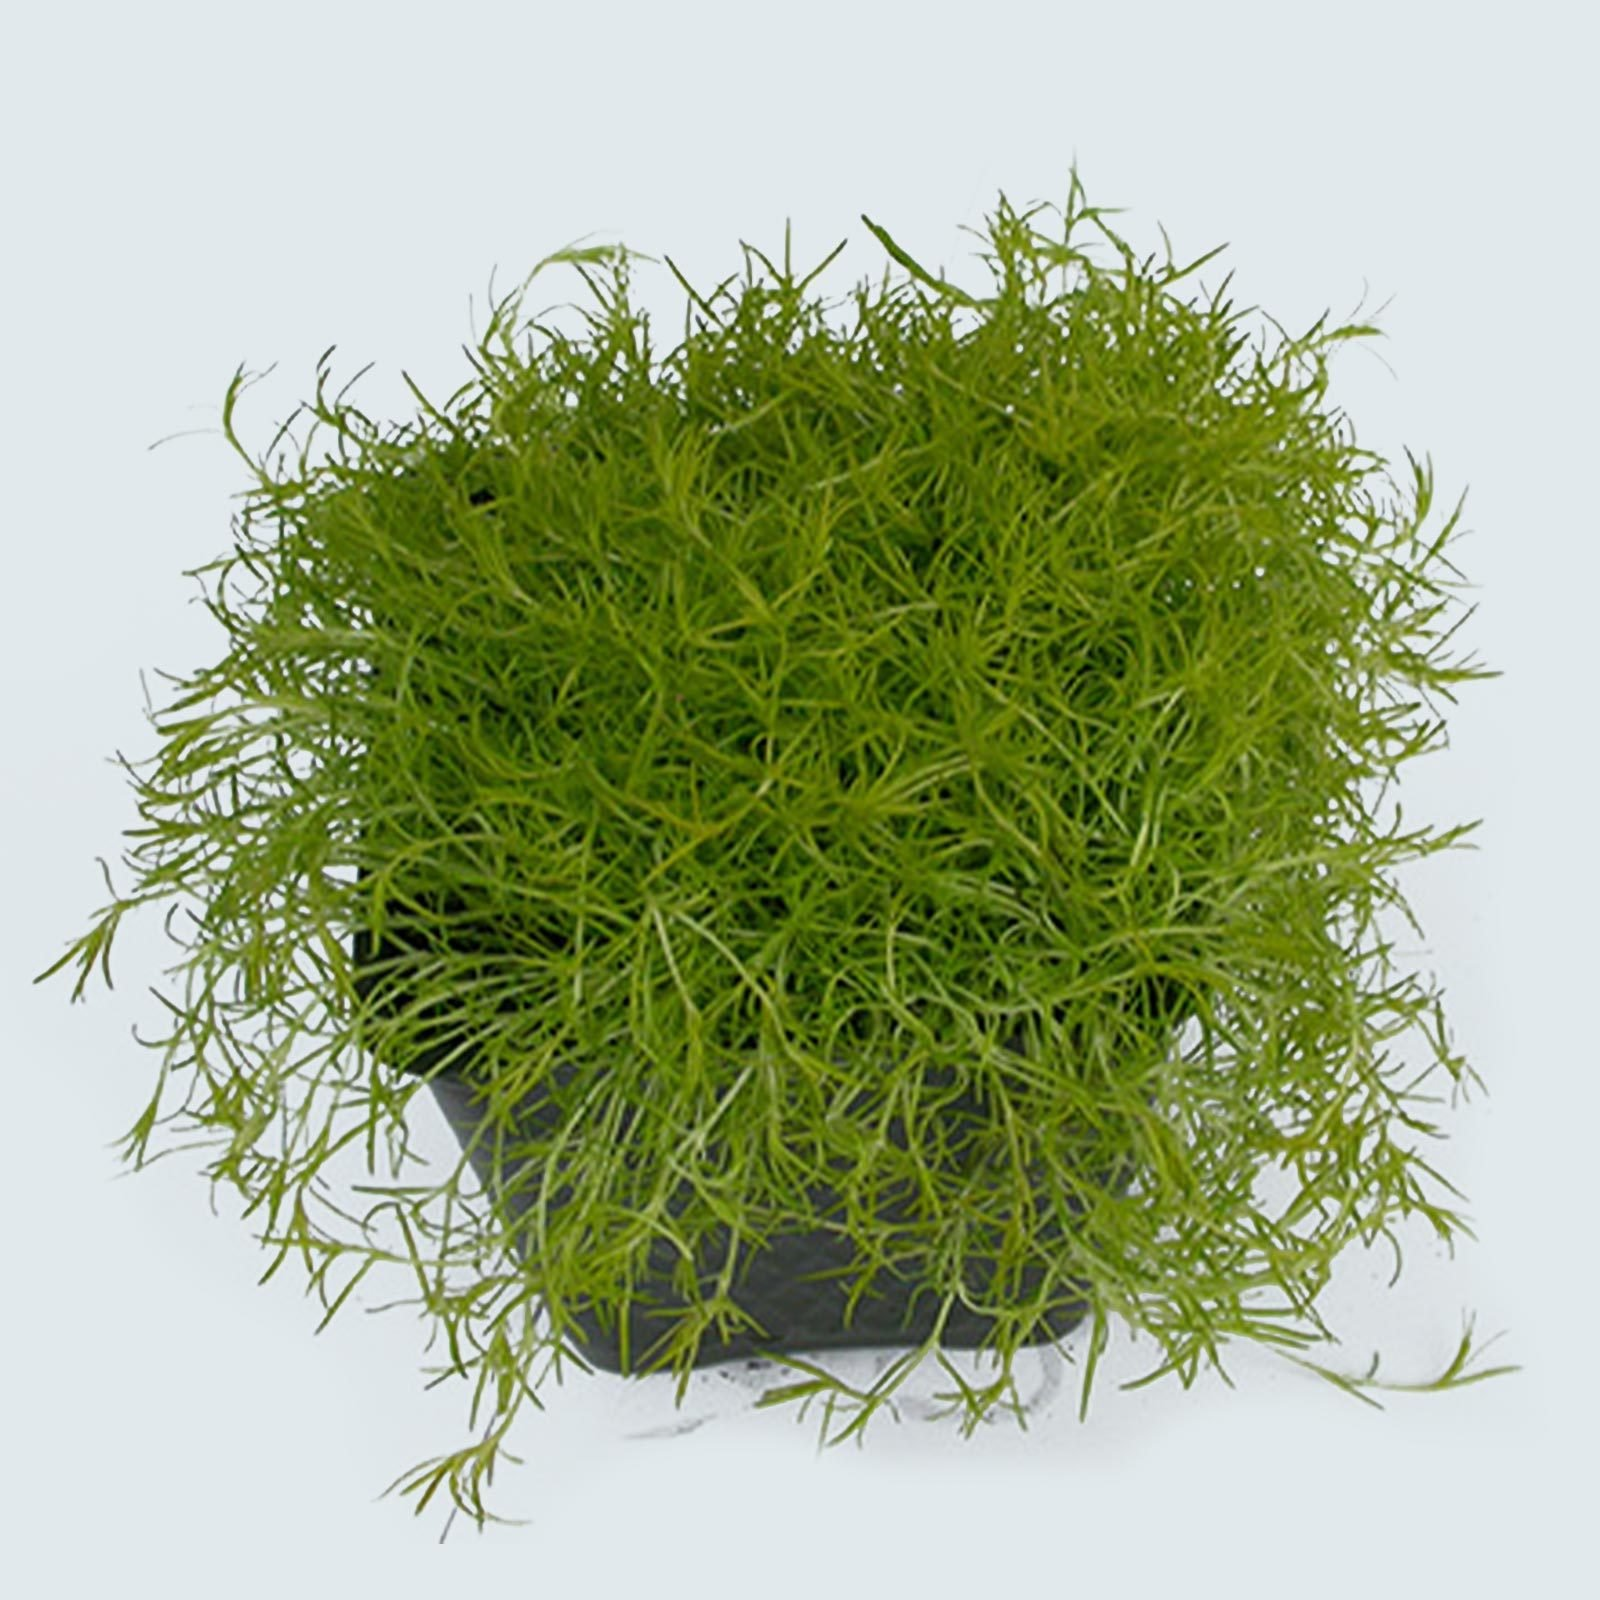 Mosses (Bryophyta)